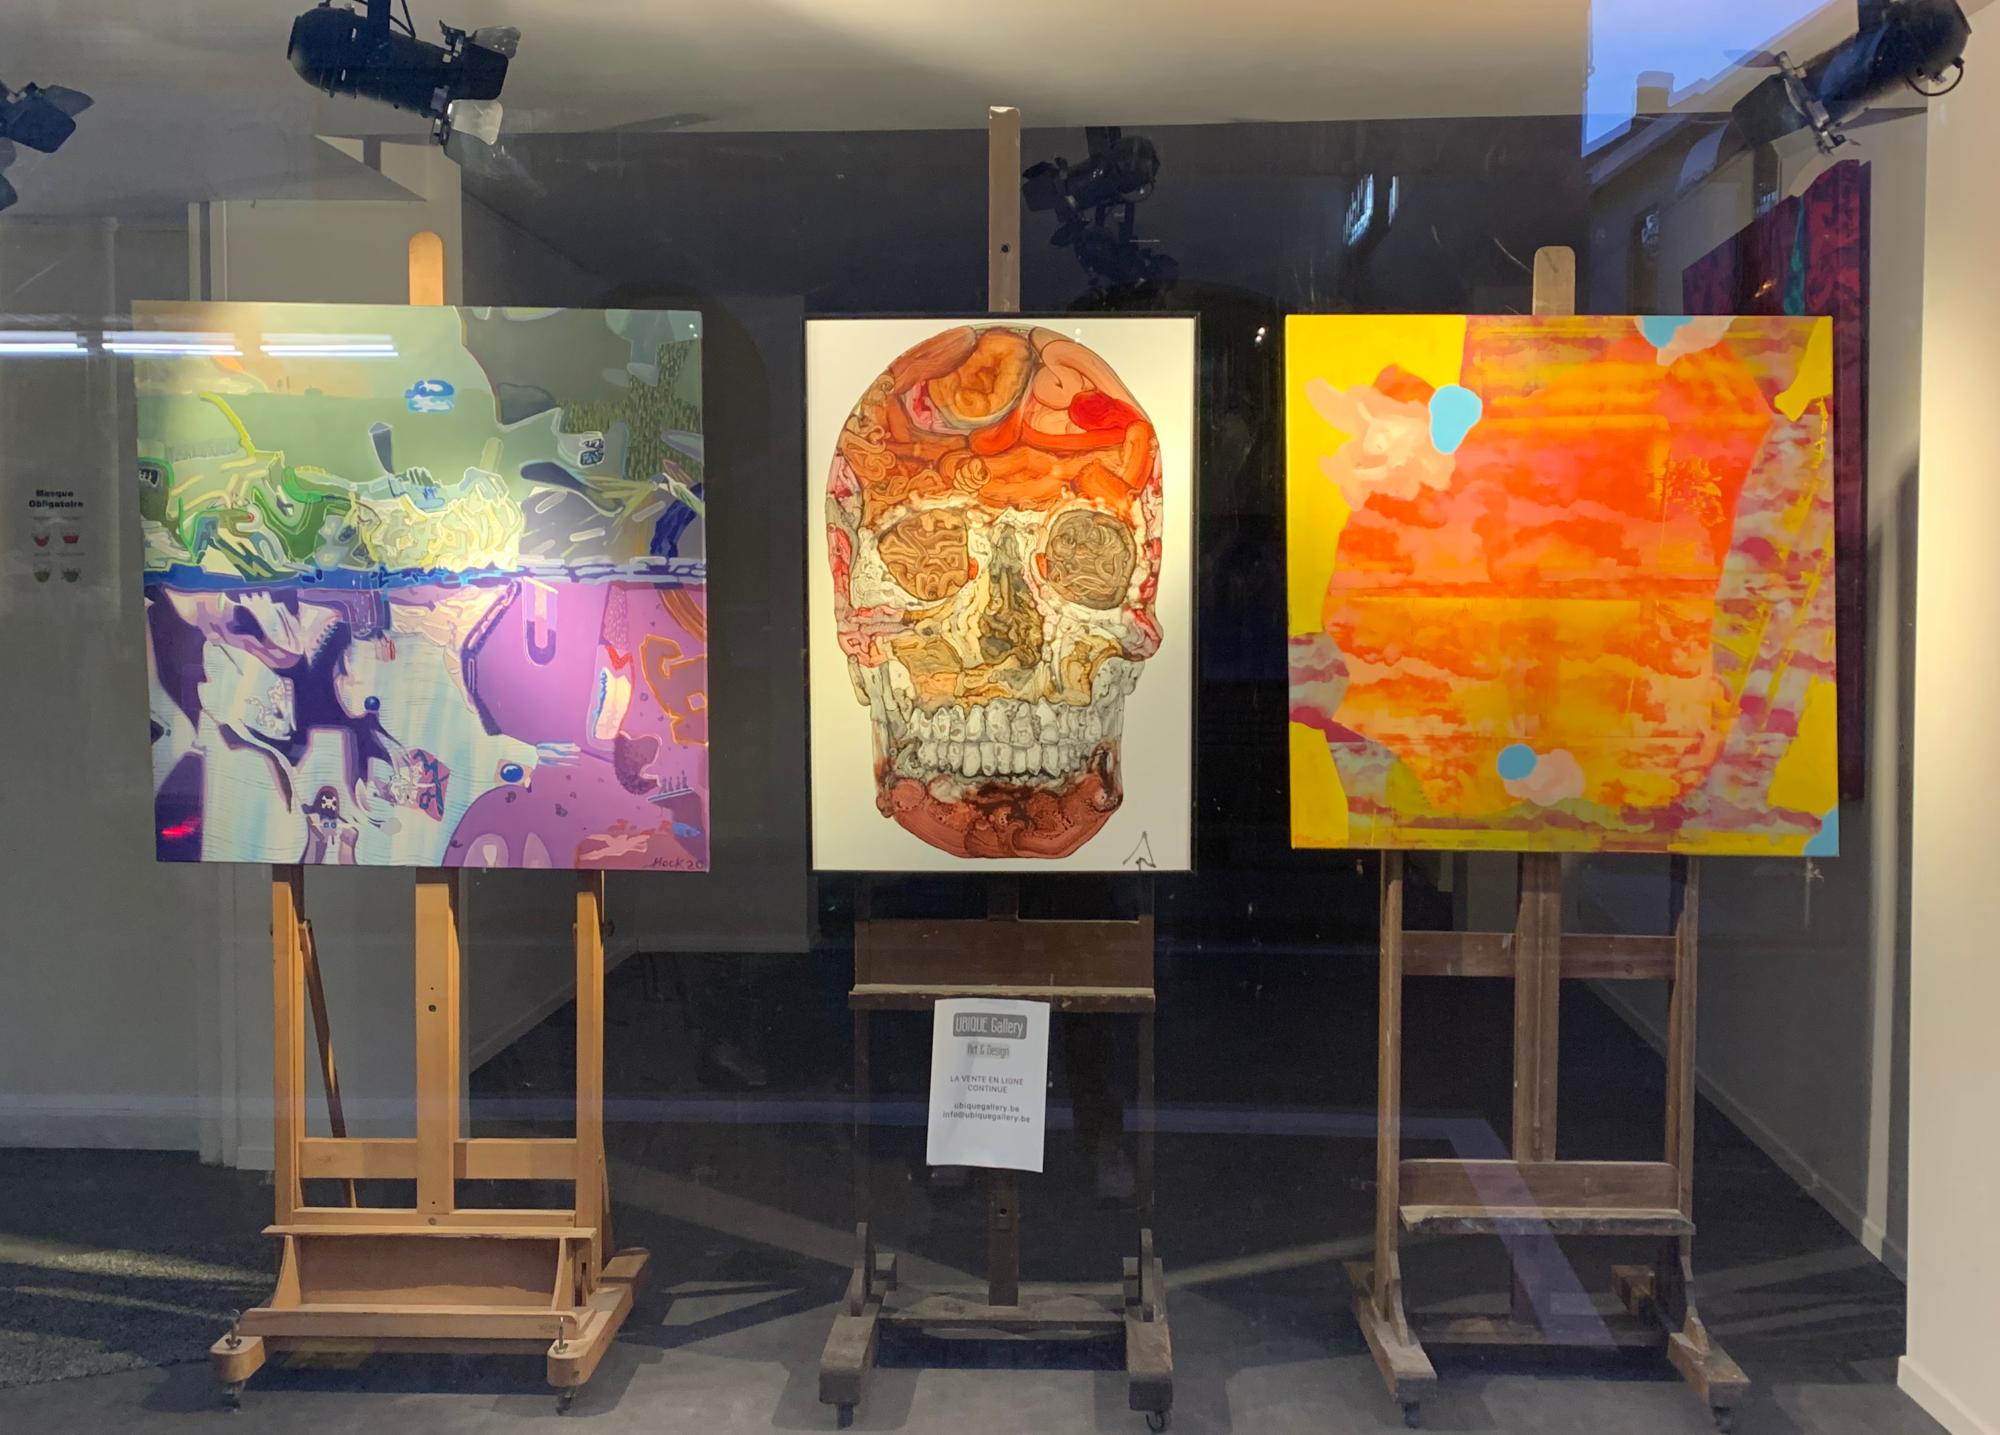 Ubique Gallery